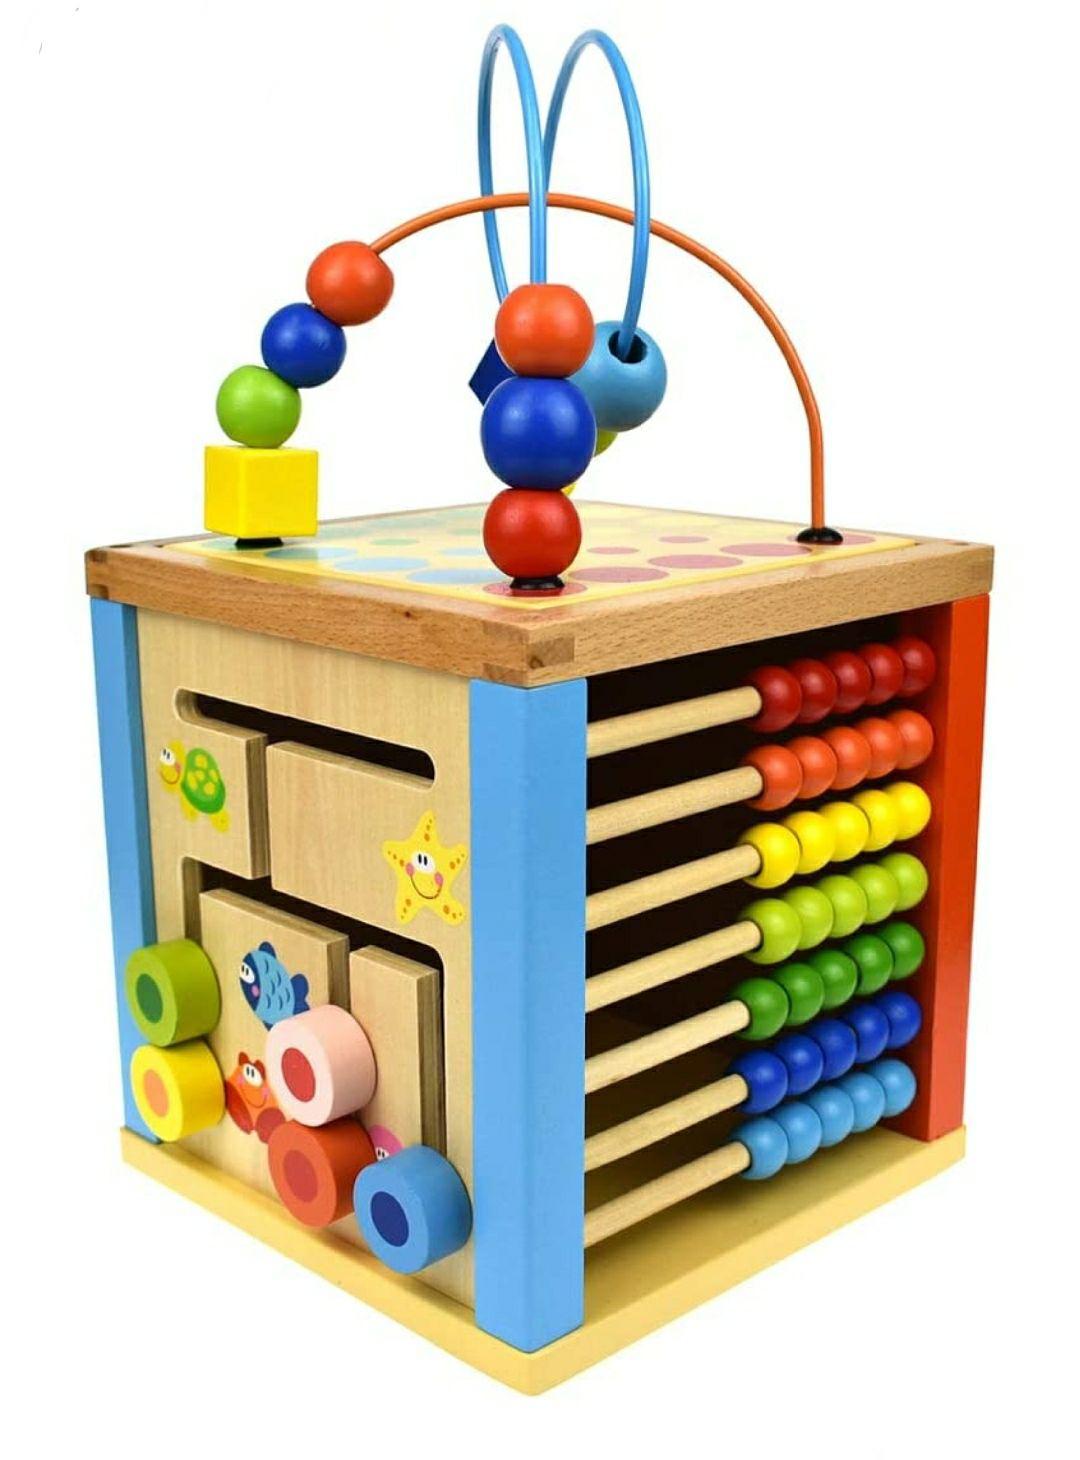 Tooky Toys TKB521 Andreu Play Cube Center, Multi Color, 19.2 x 19.2 x 19.2 cm